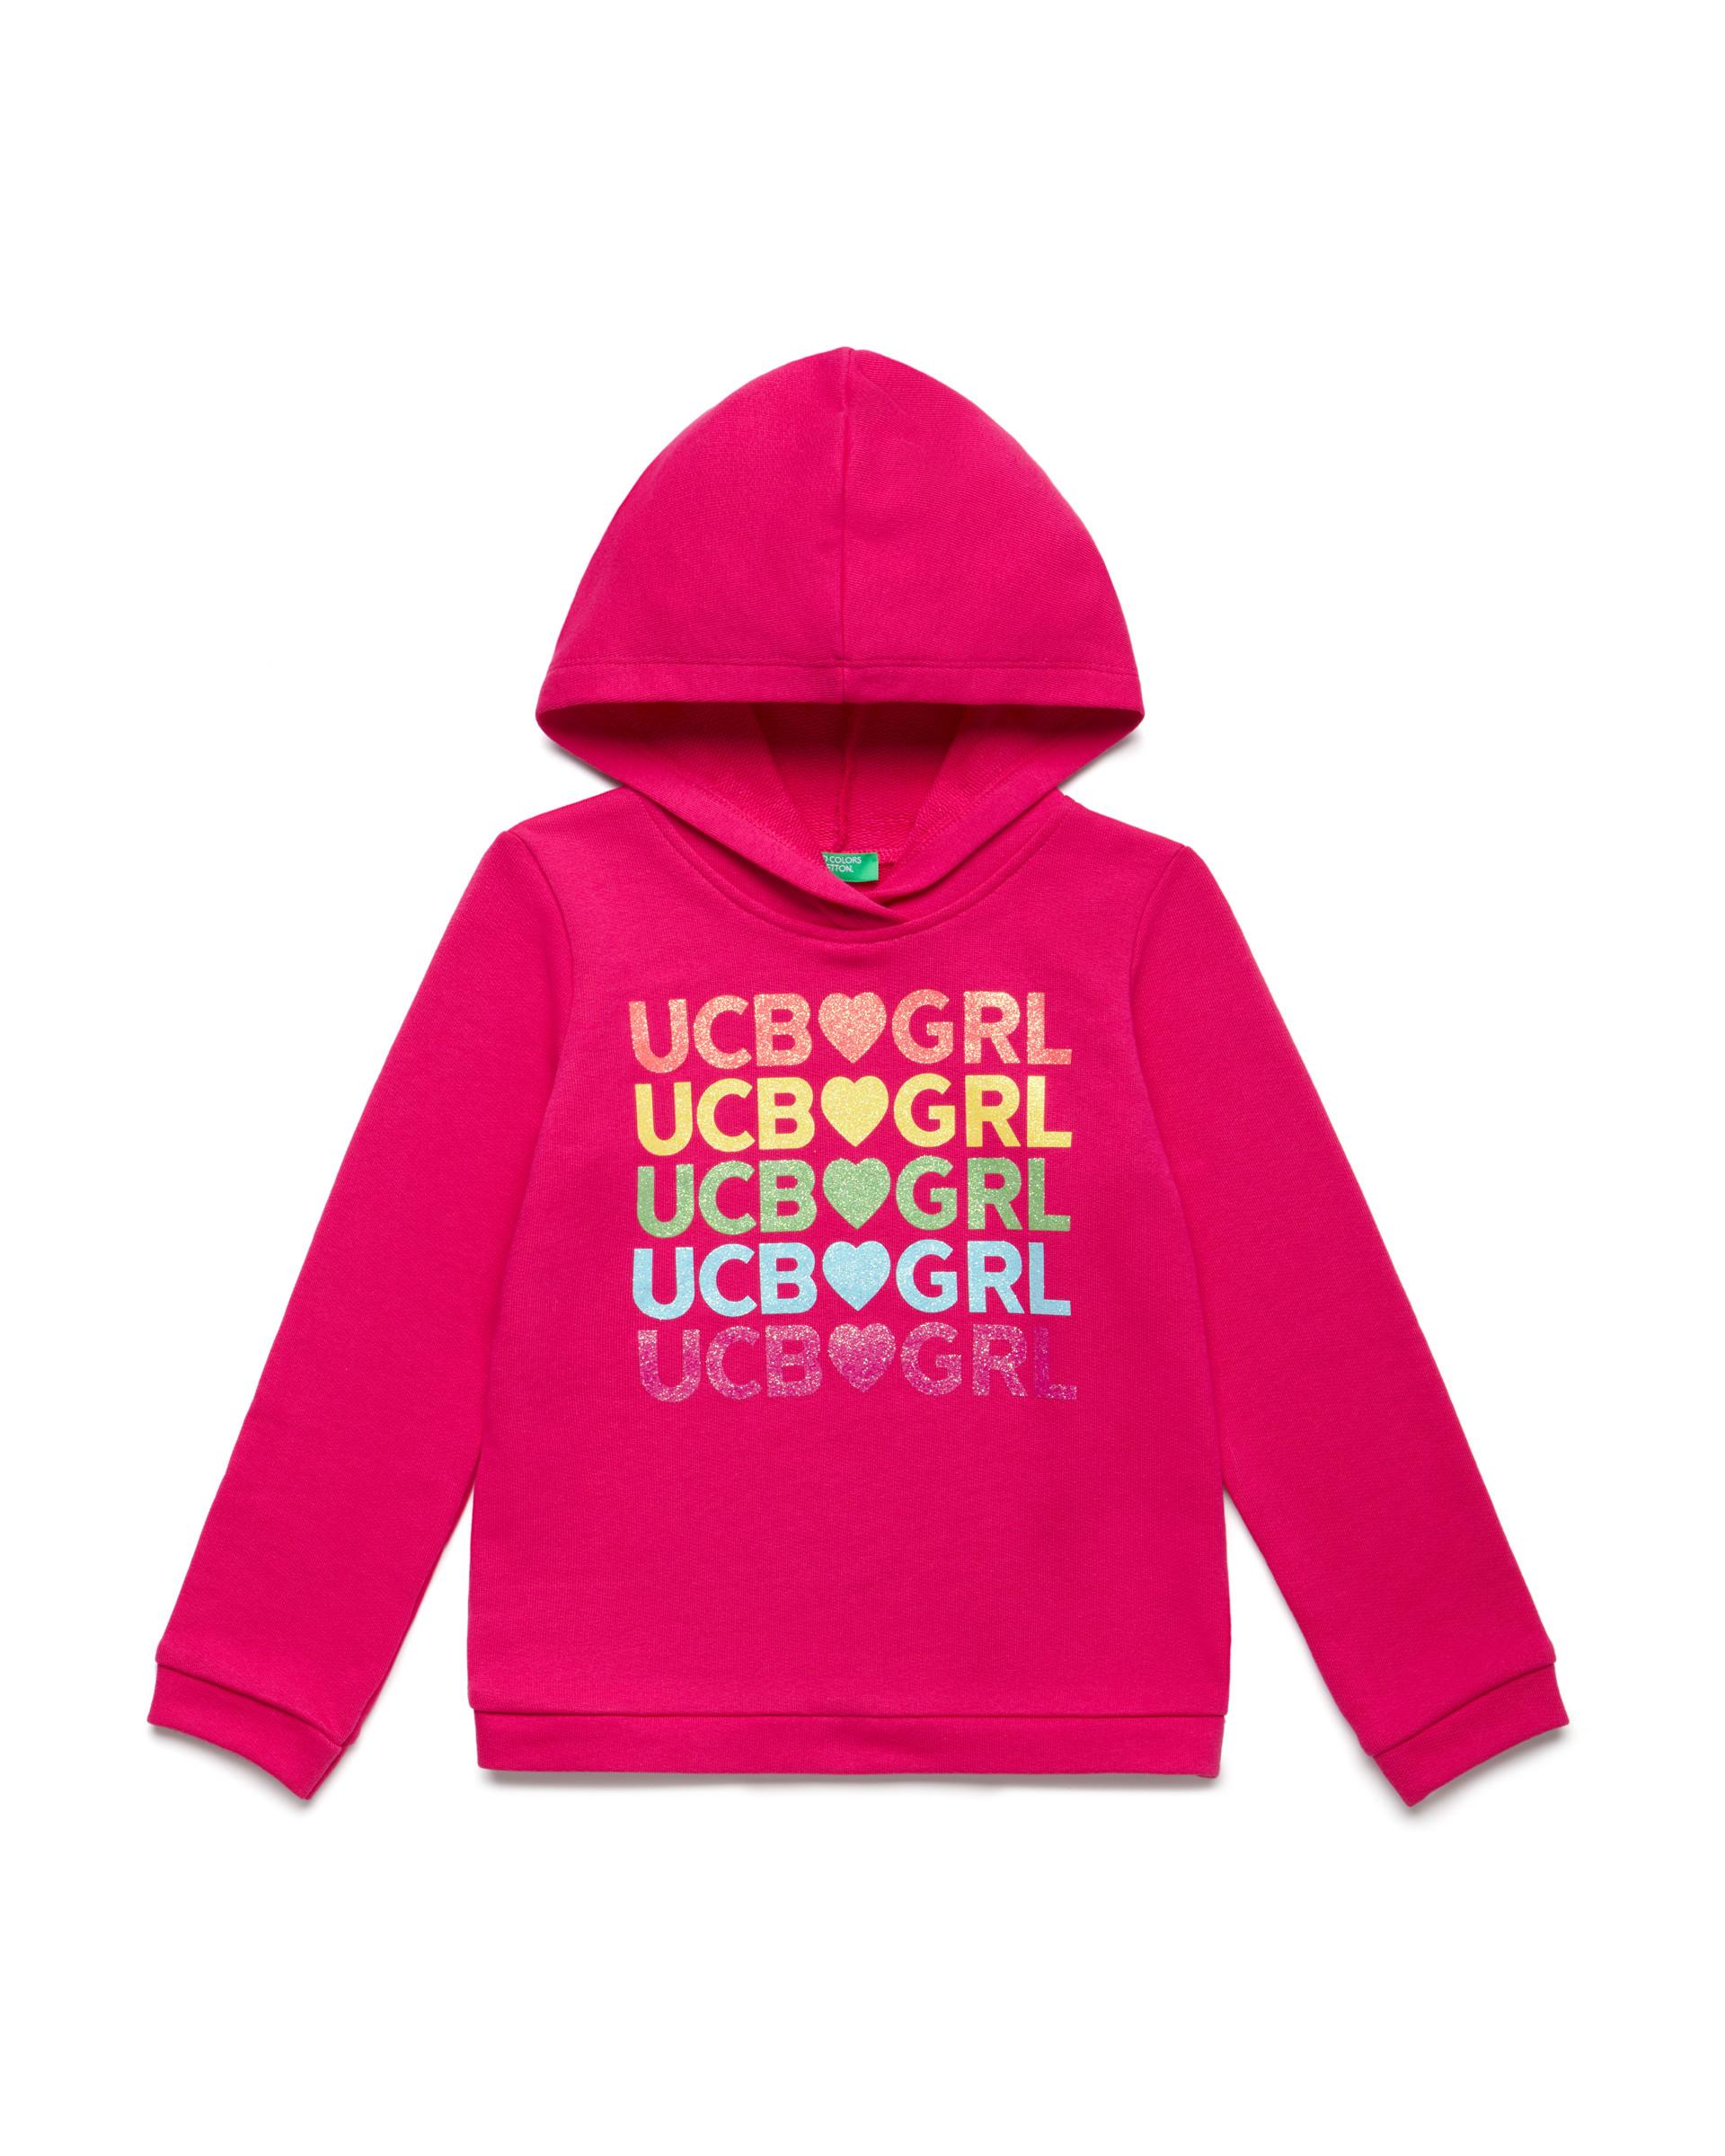 Купить 20P_3J68C2171_2L3, Толстовка для девочек Benetton 3J68C2171_2L3 р-р 104, United Colors of Benetton, Толстовки для девочек